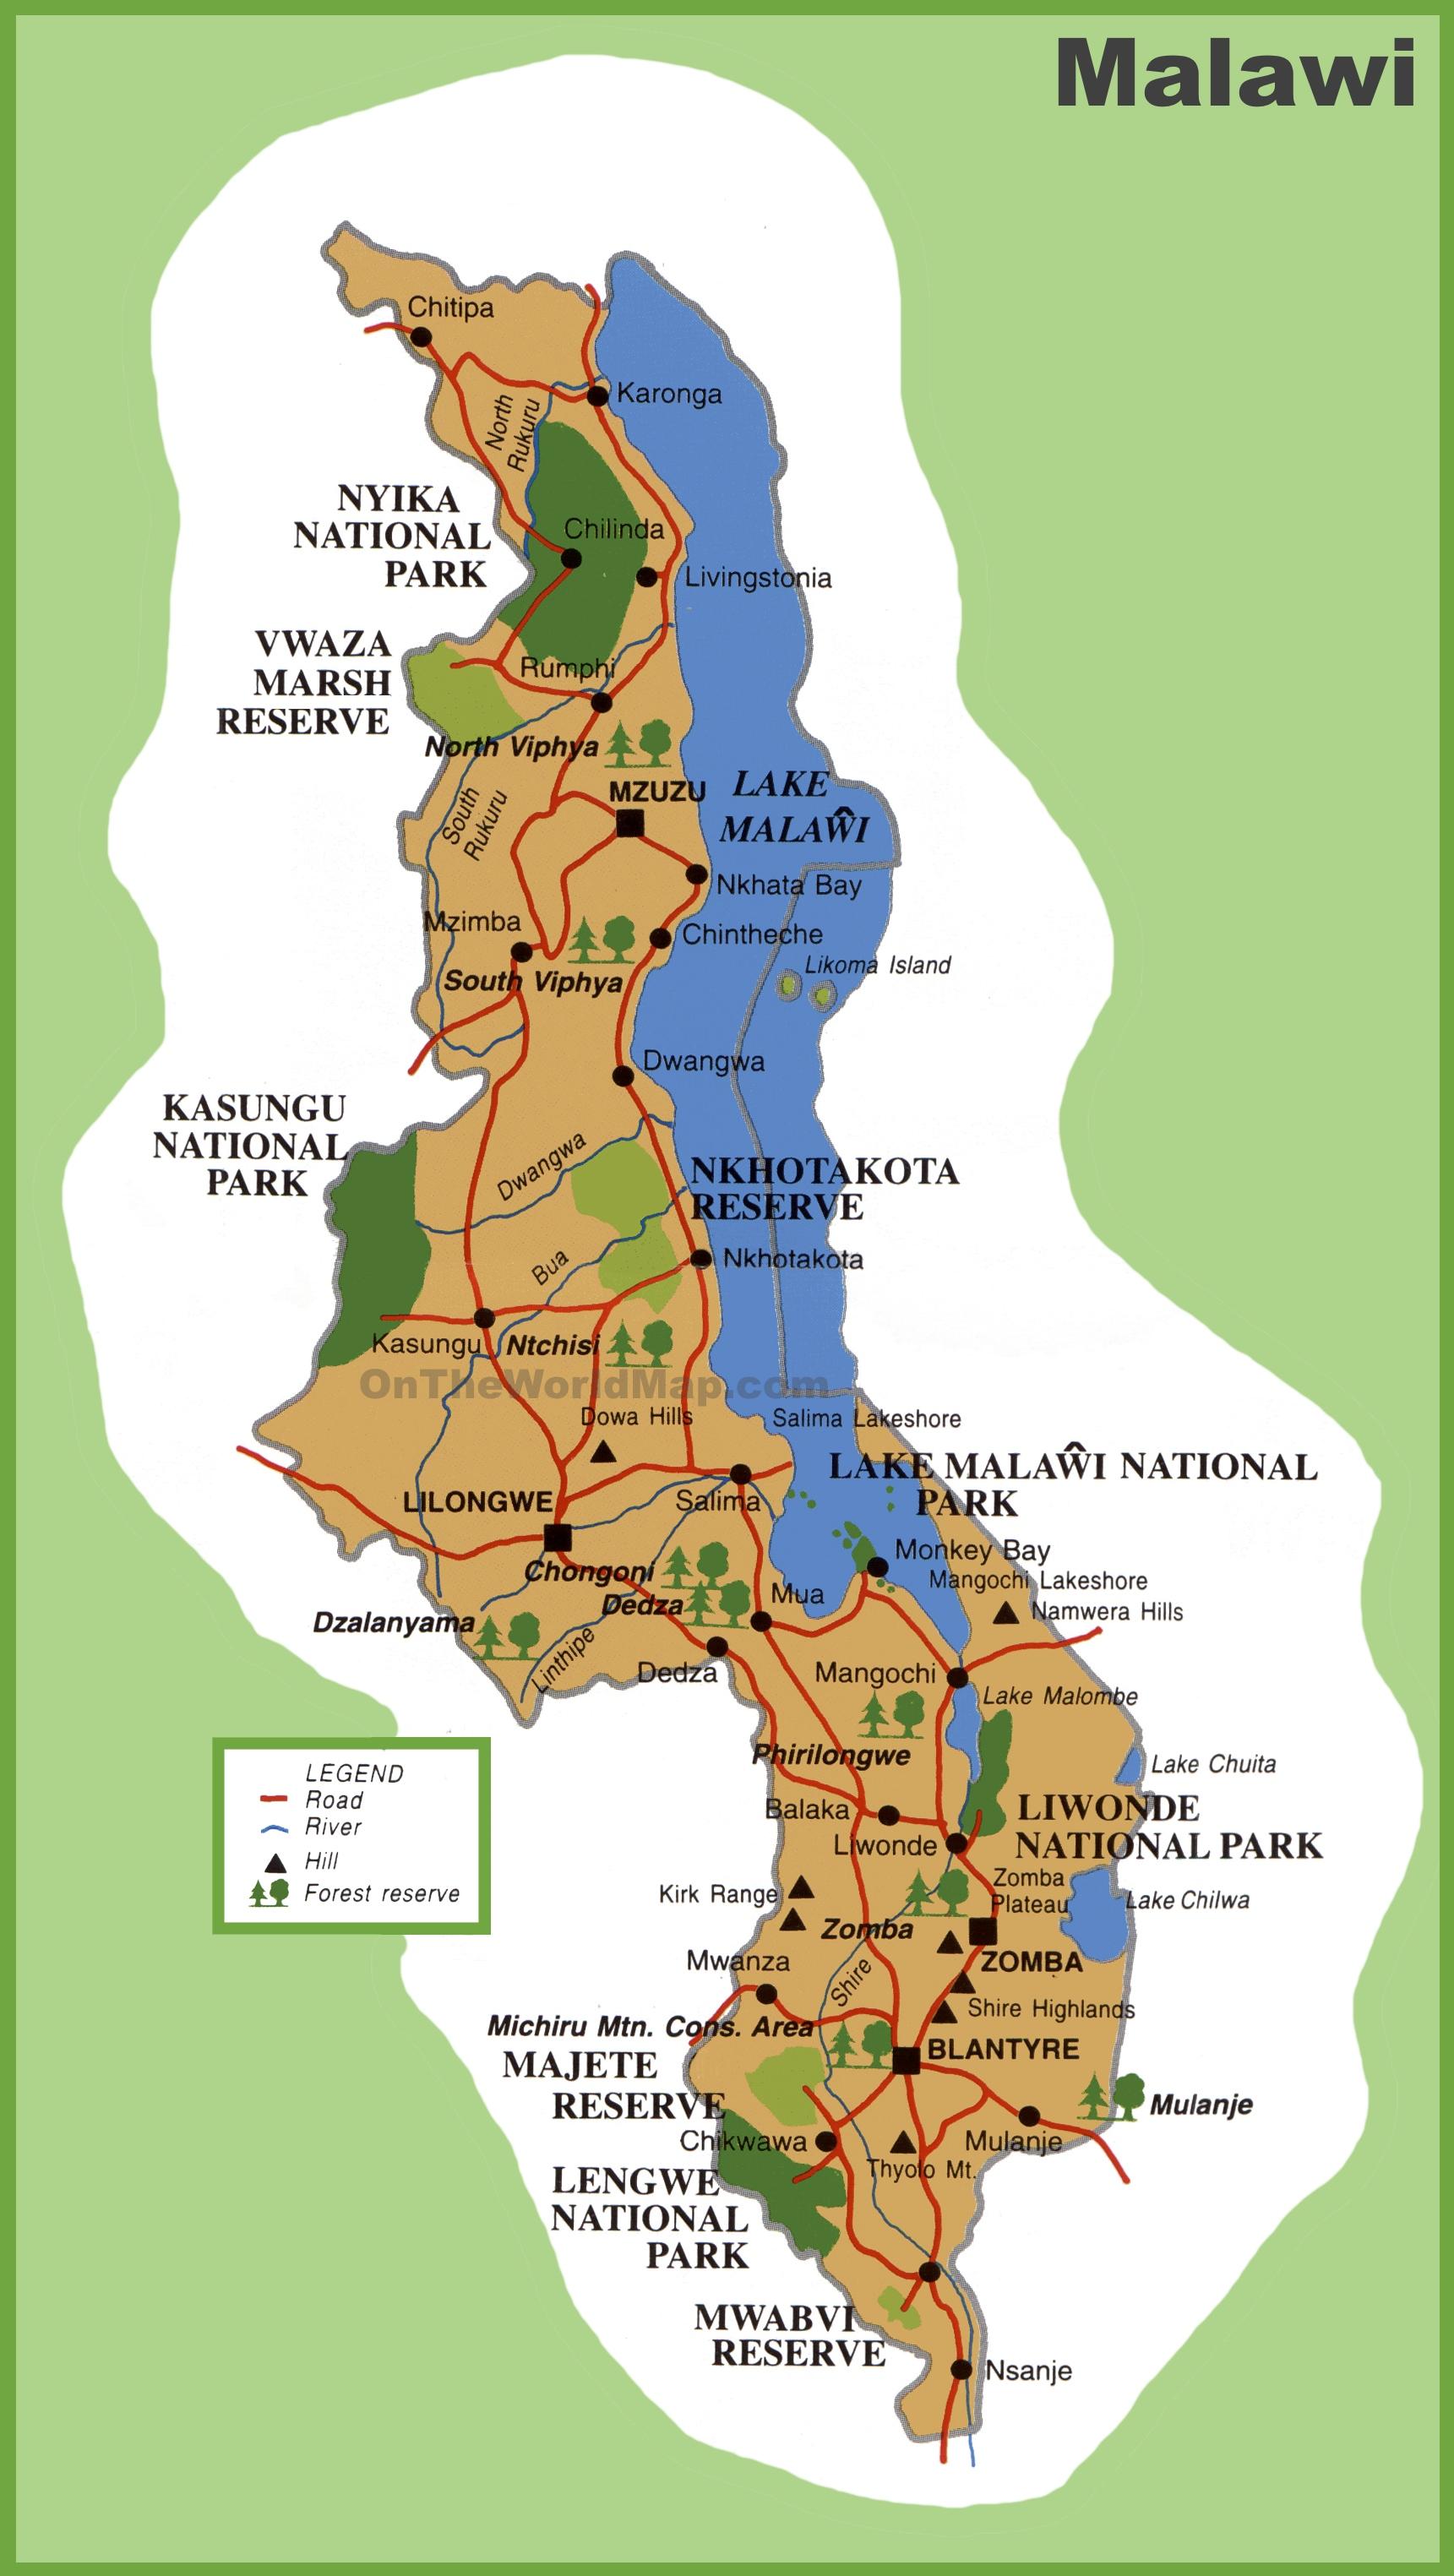 Malawi Maps Maps Of Malawi - Malawi map